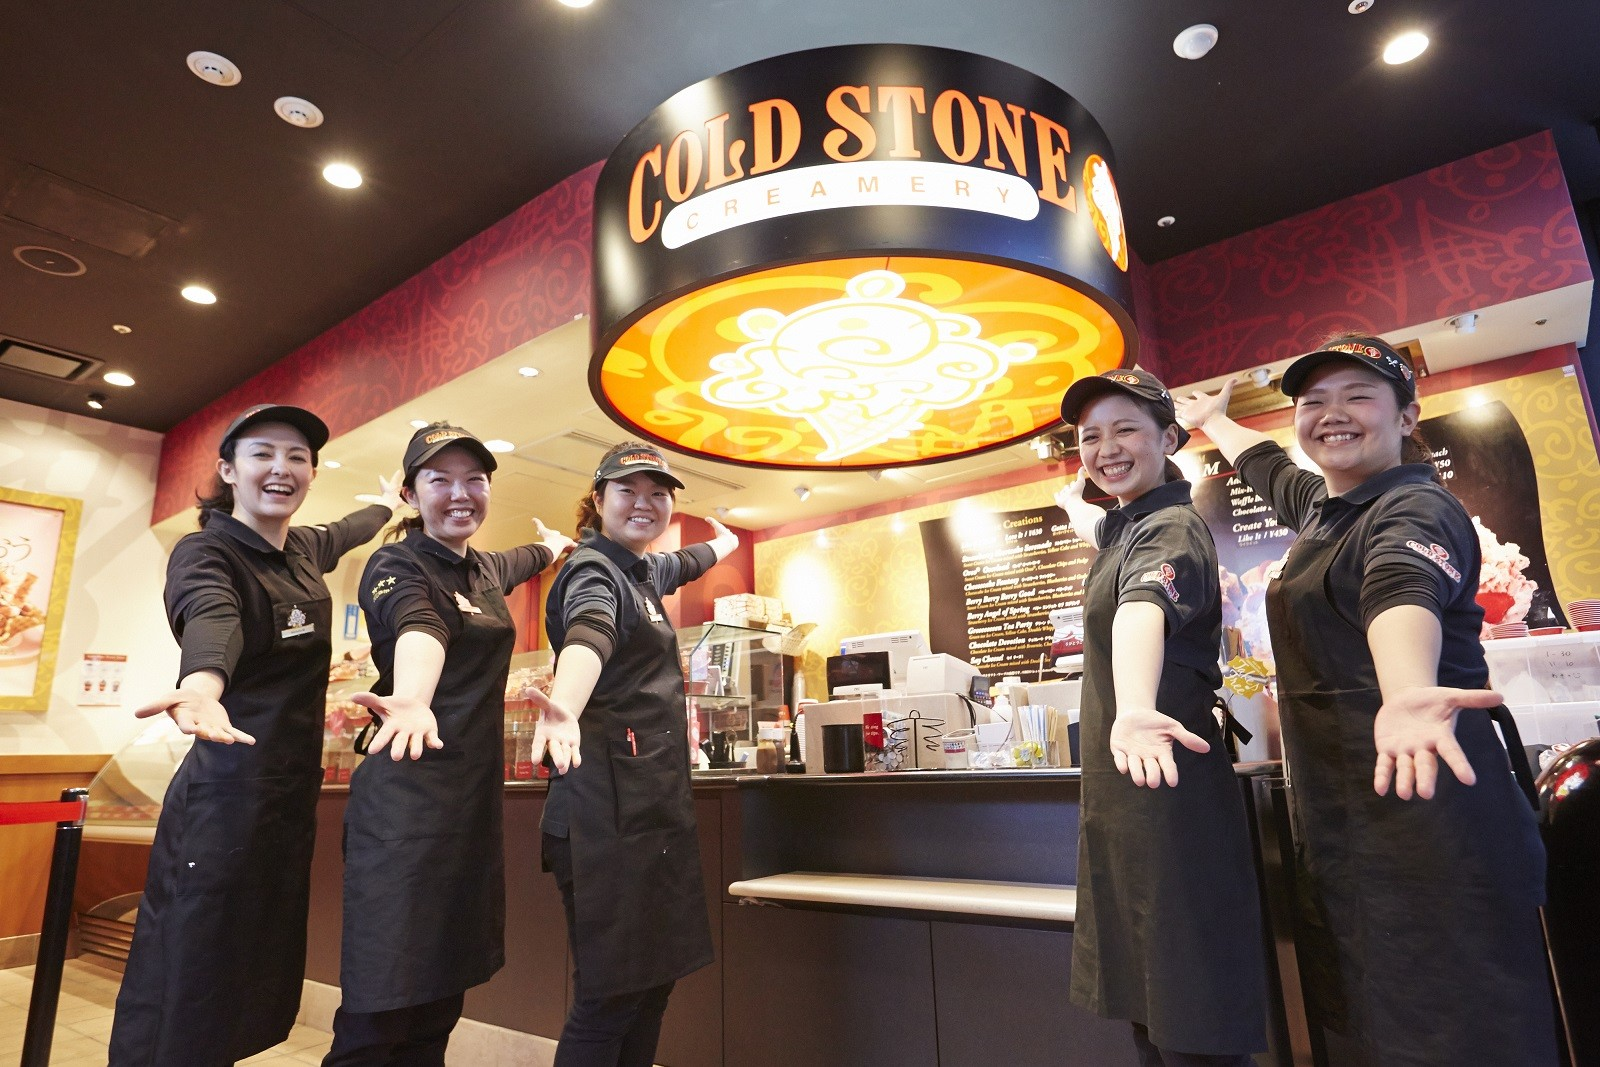 COLD STONE CREAMERY(コールドストーンクリーマリー) ららぽーと TOKYO-BAY店のアルバイト情報